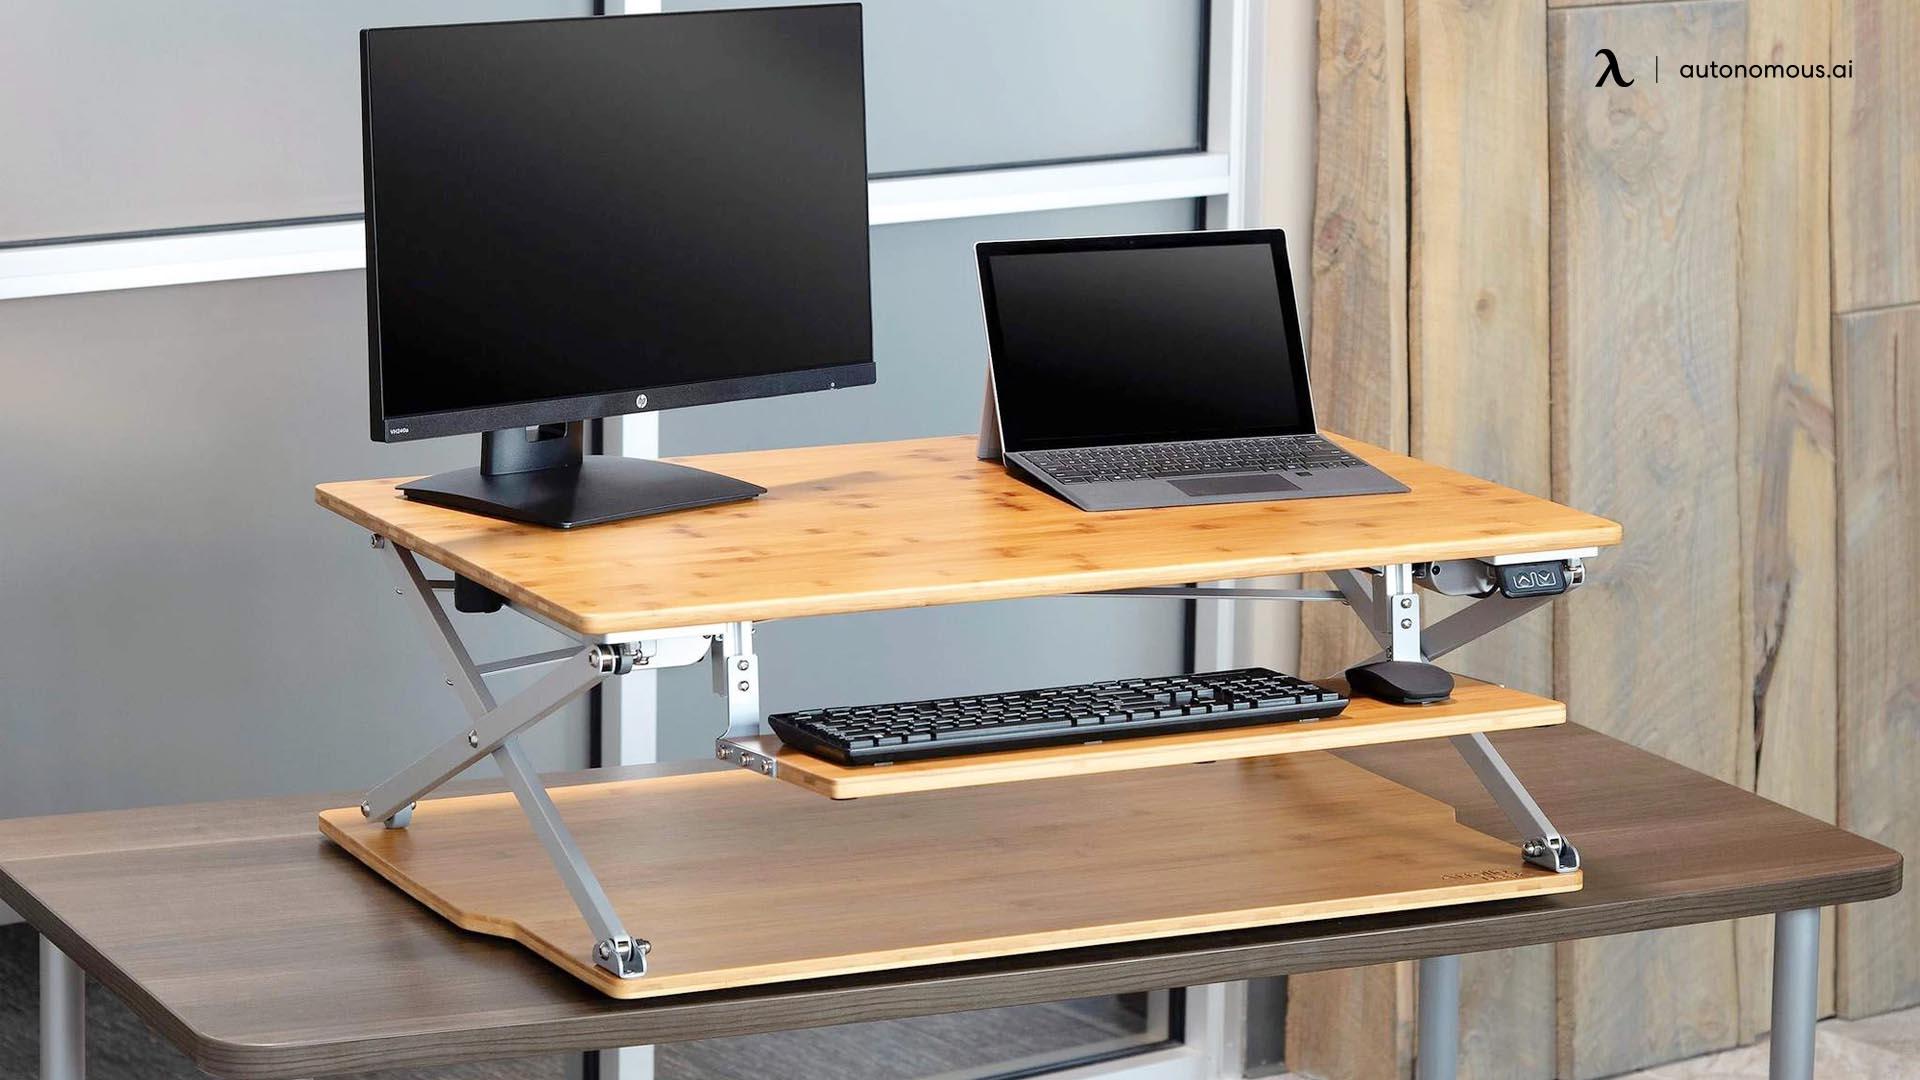 Attollo Desk - Height Adjustable Desk by Office Kick Inc